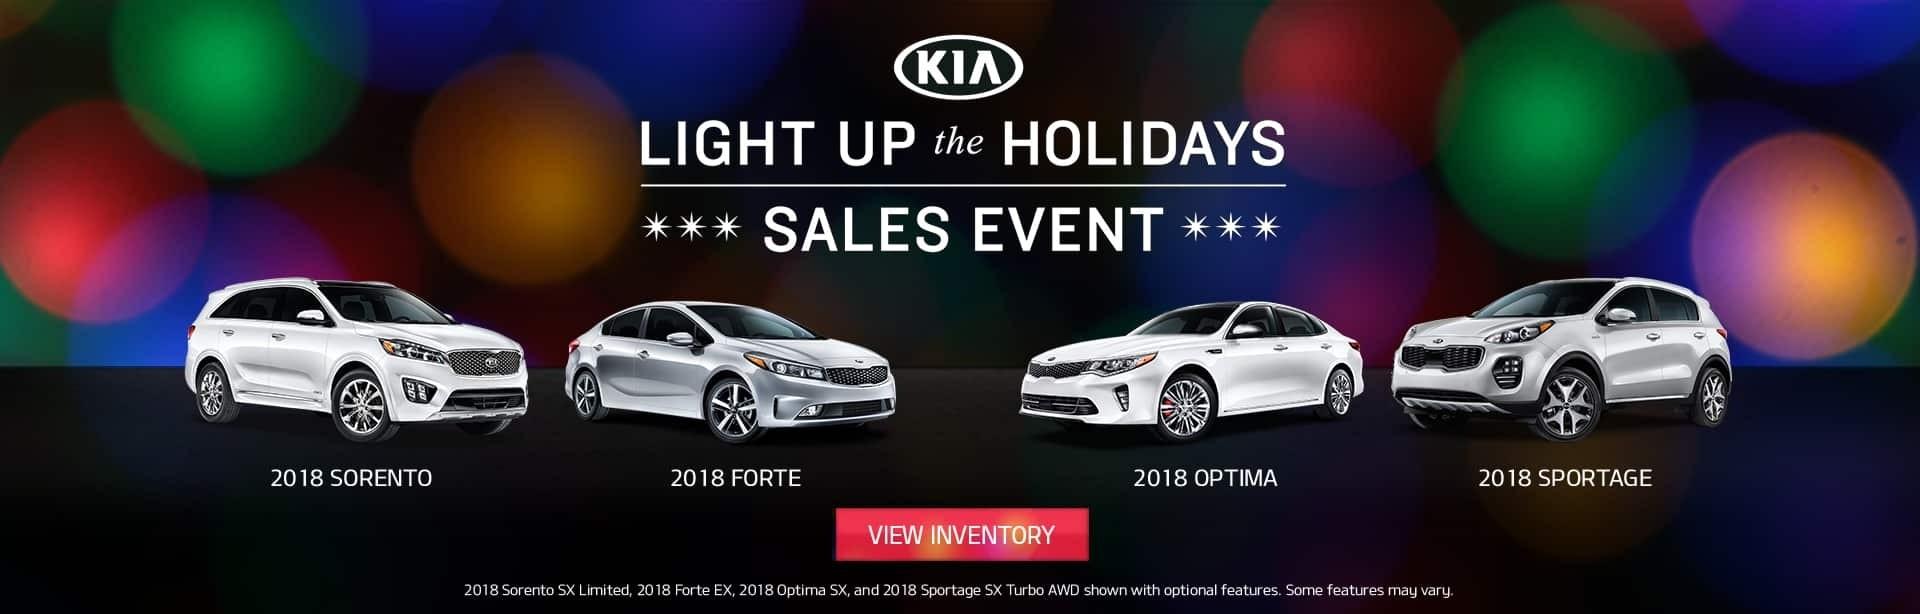 Kia-LightUpTheHolidays